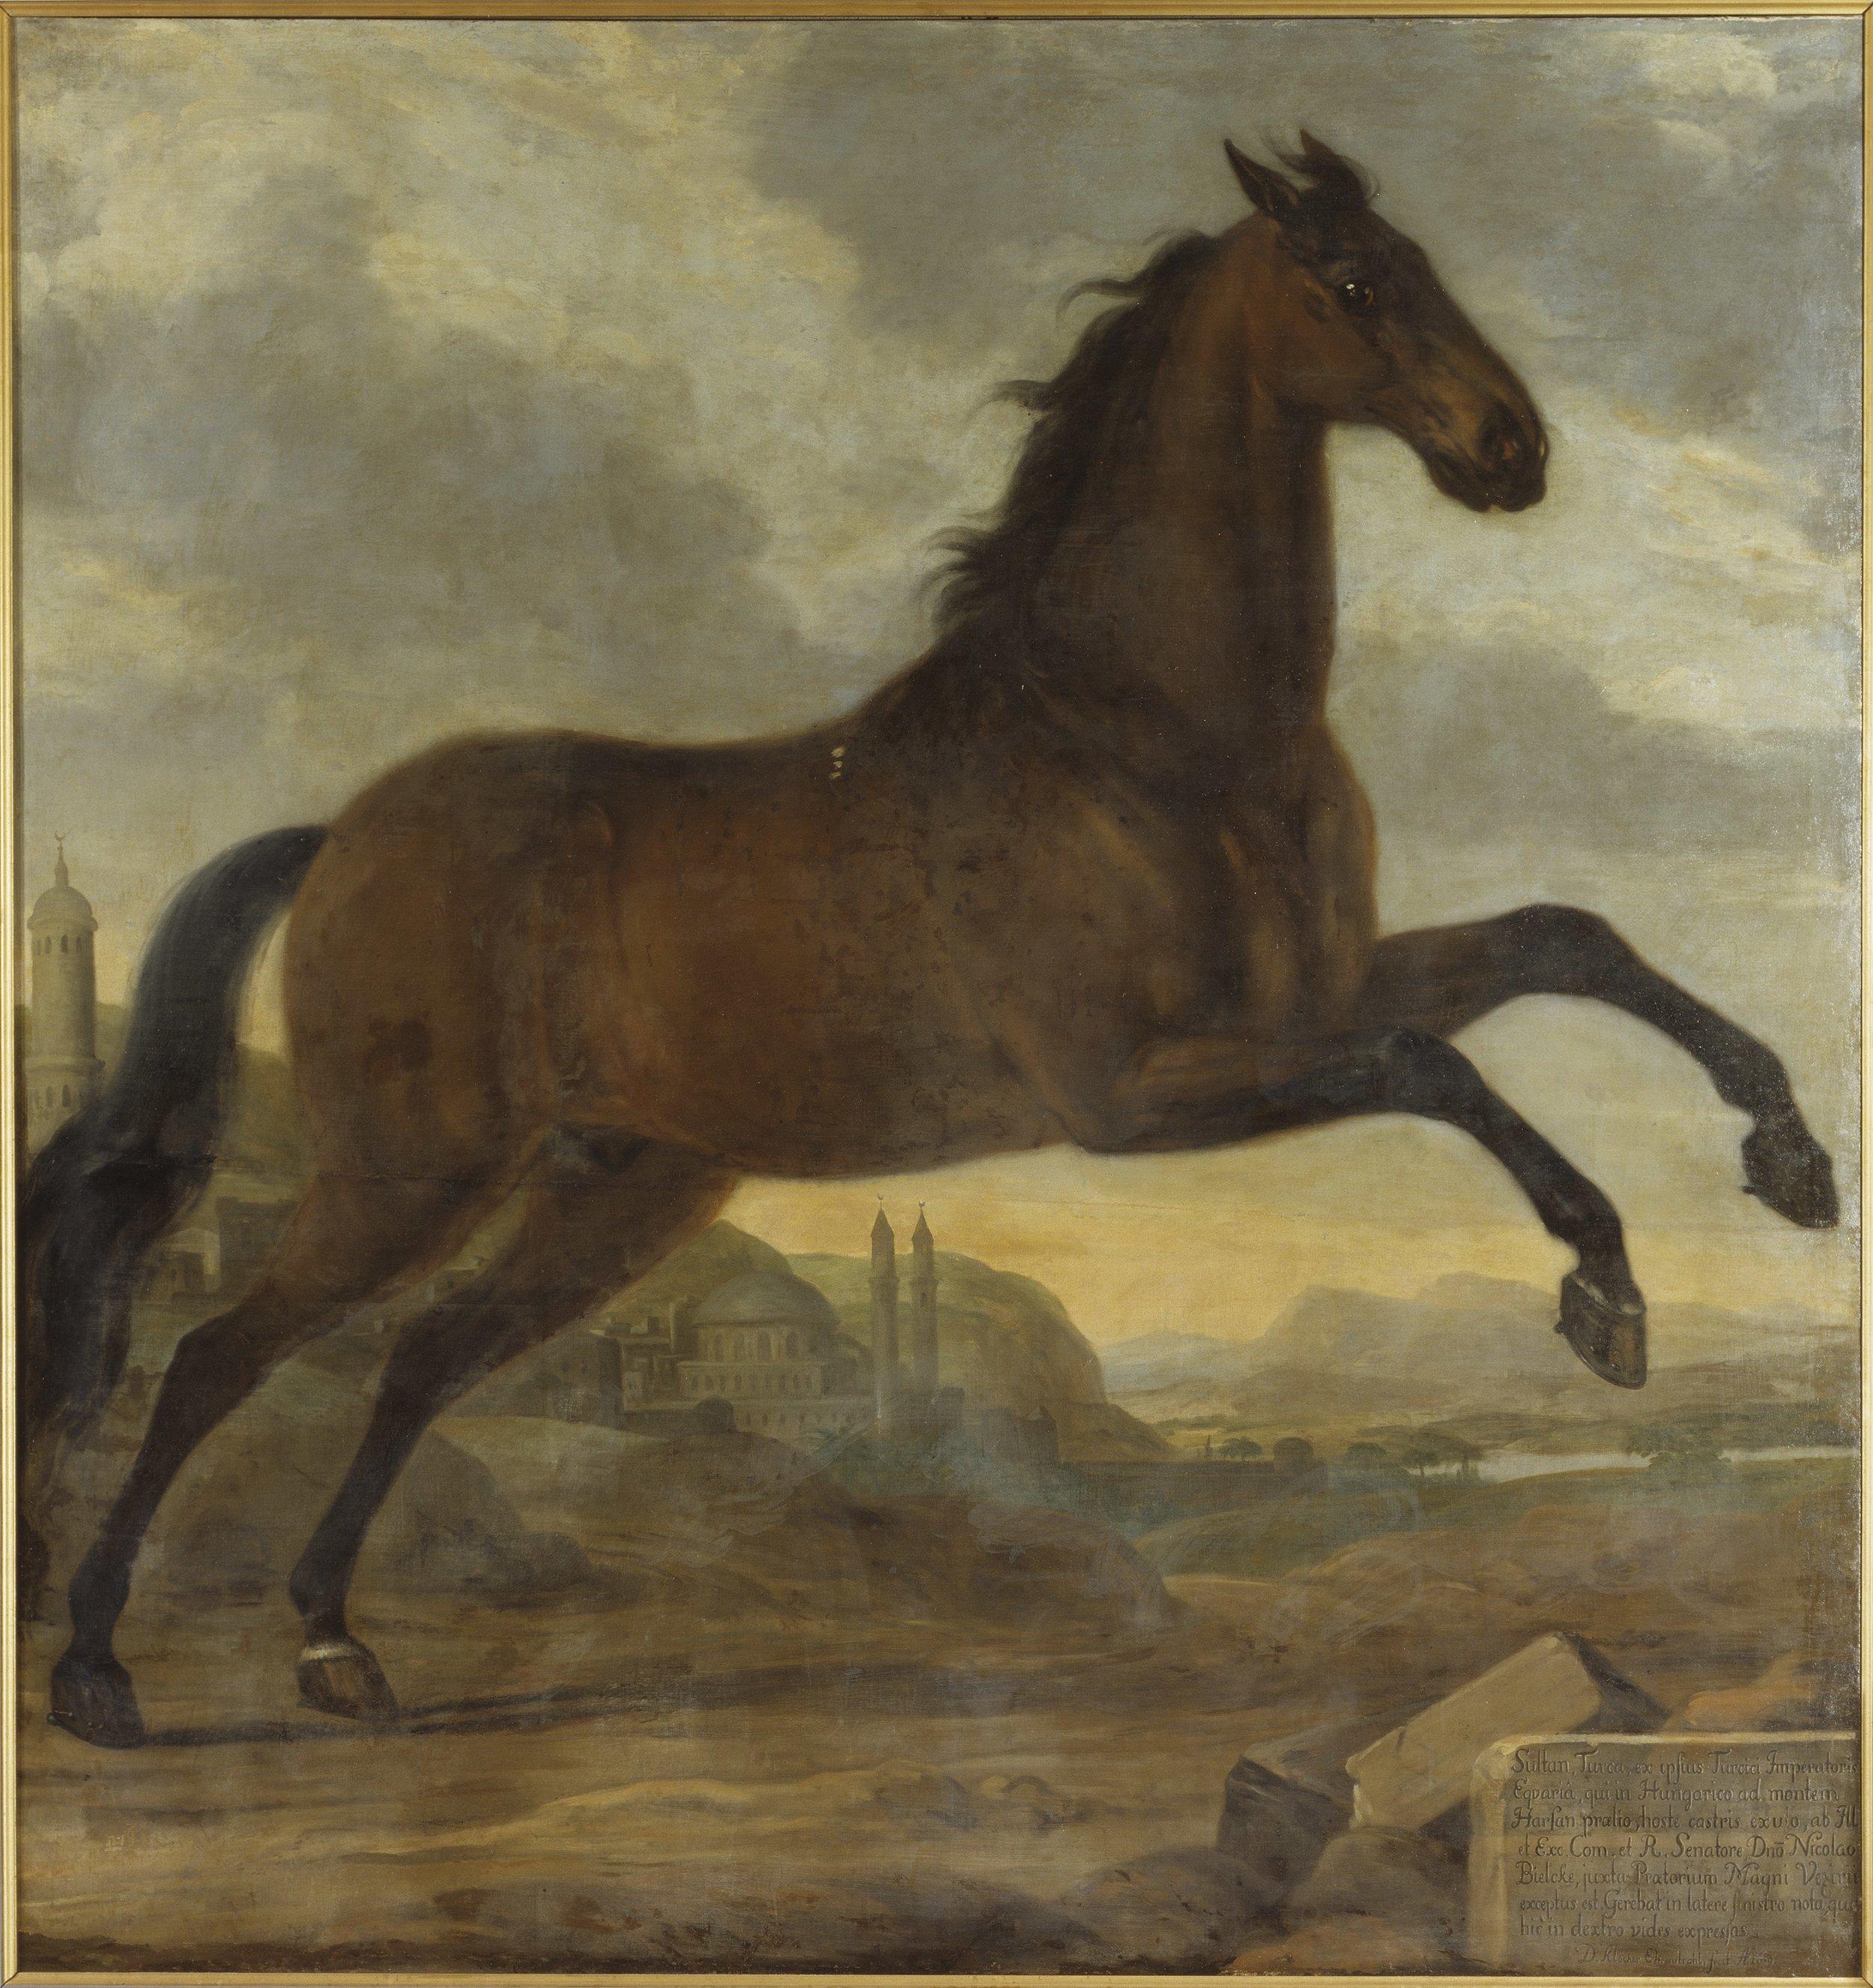 David Klöcker Ehrenstrahl,  Karl XIs livhäst Sultan, 1689, Nationalmuseum